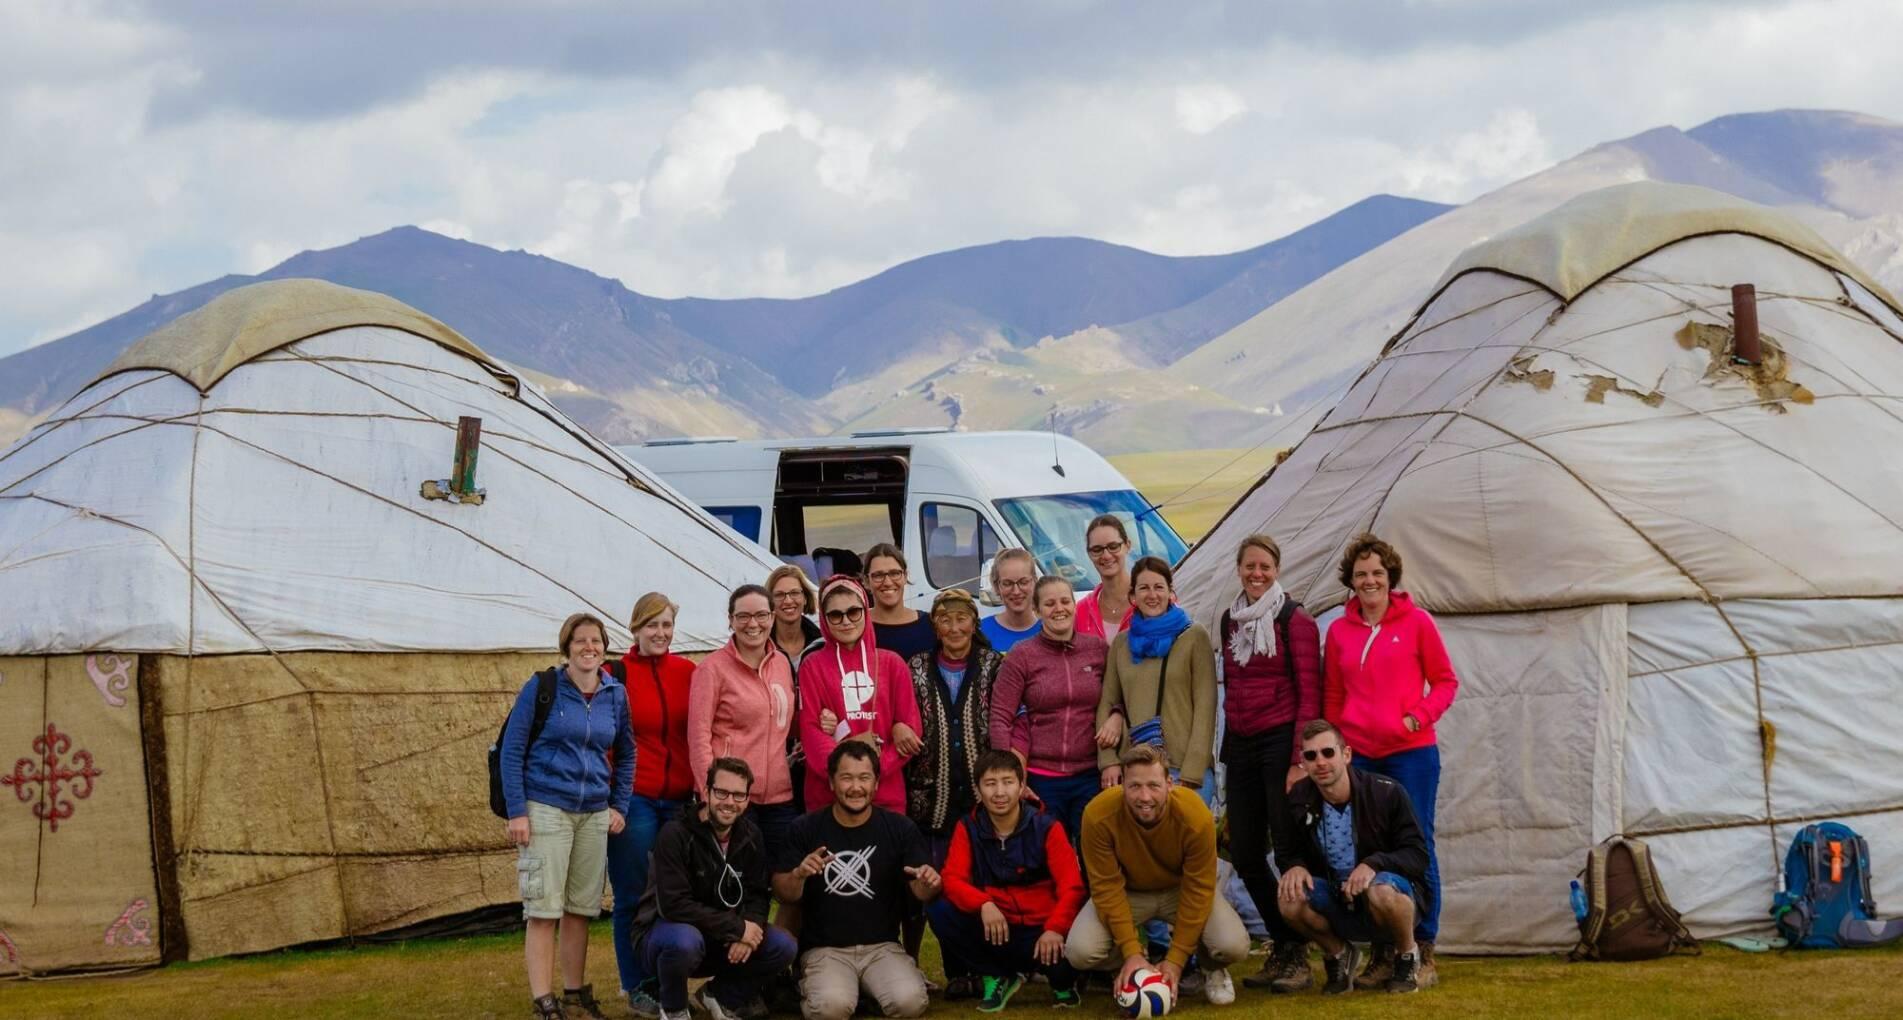 Avontuurlijk Kirgizië: Himalaya, yurts en nomaden - Kirgizië - 1